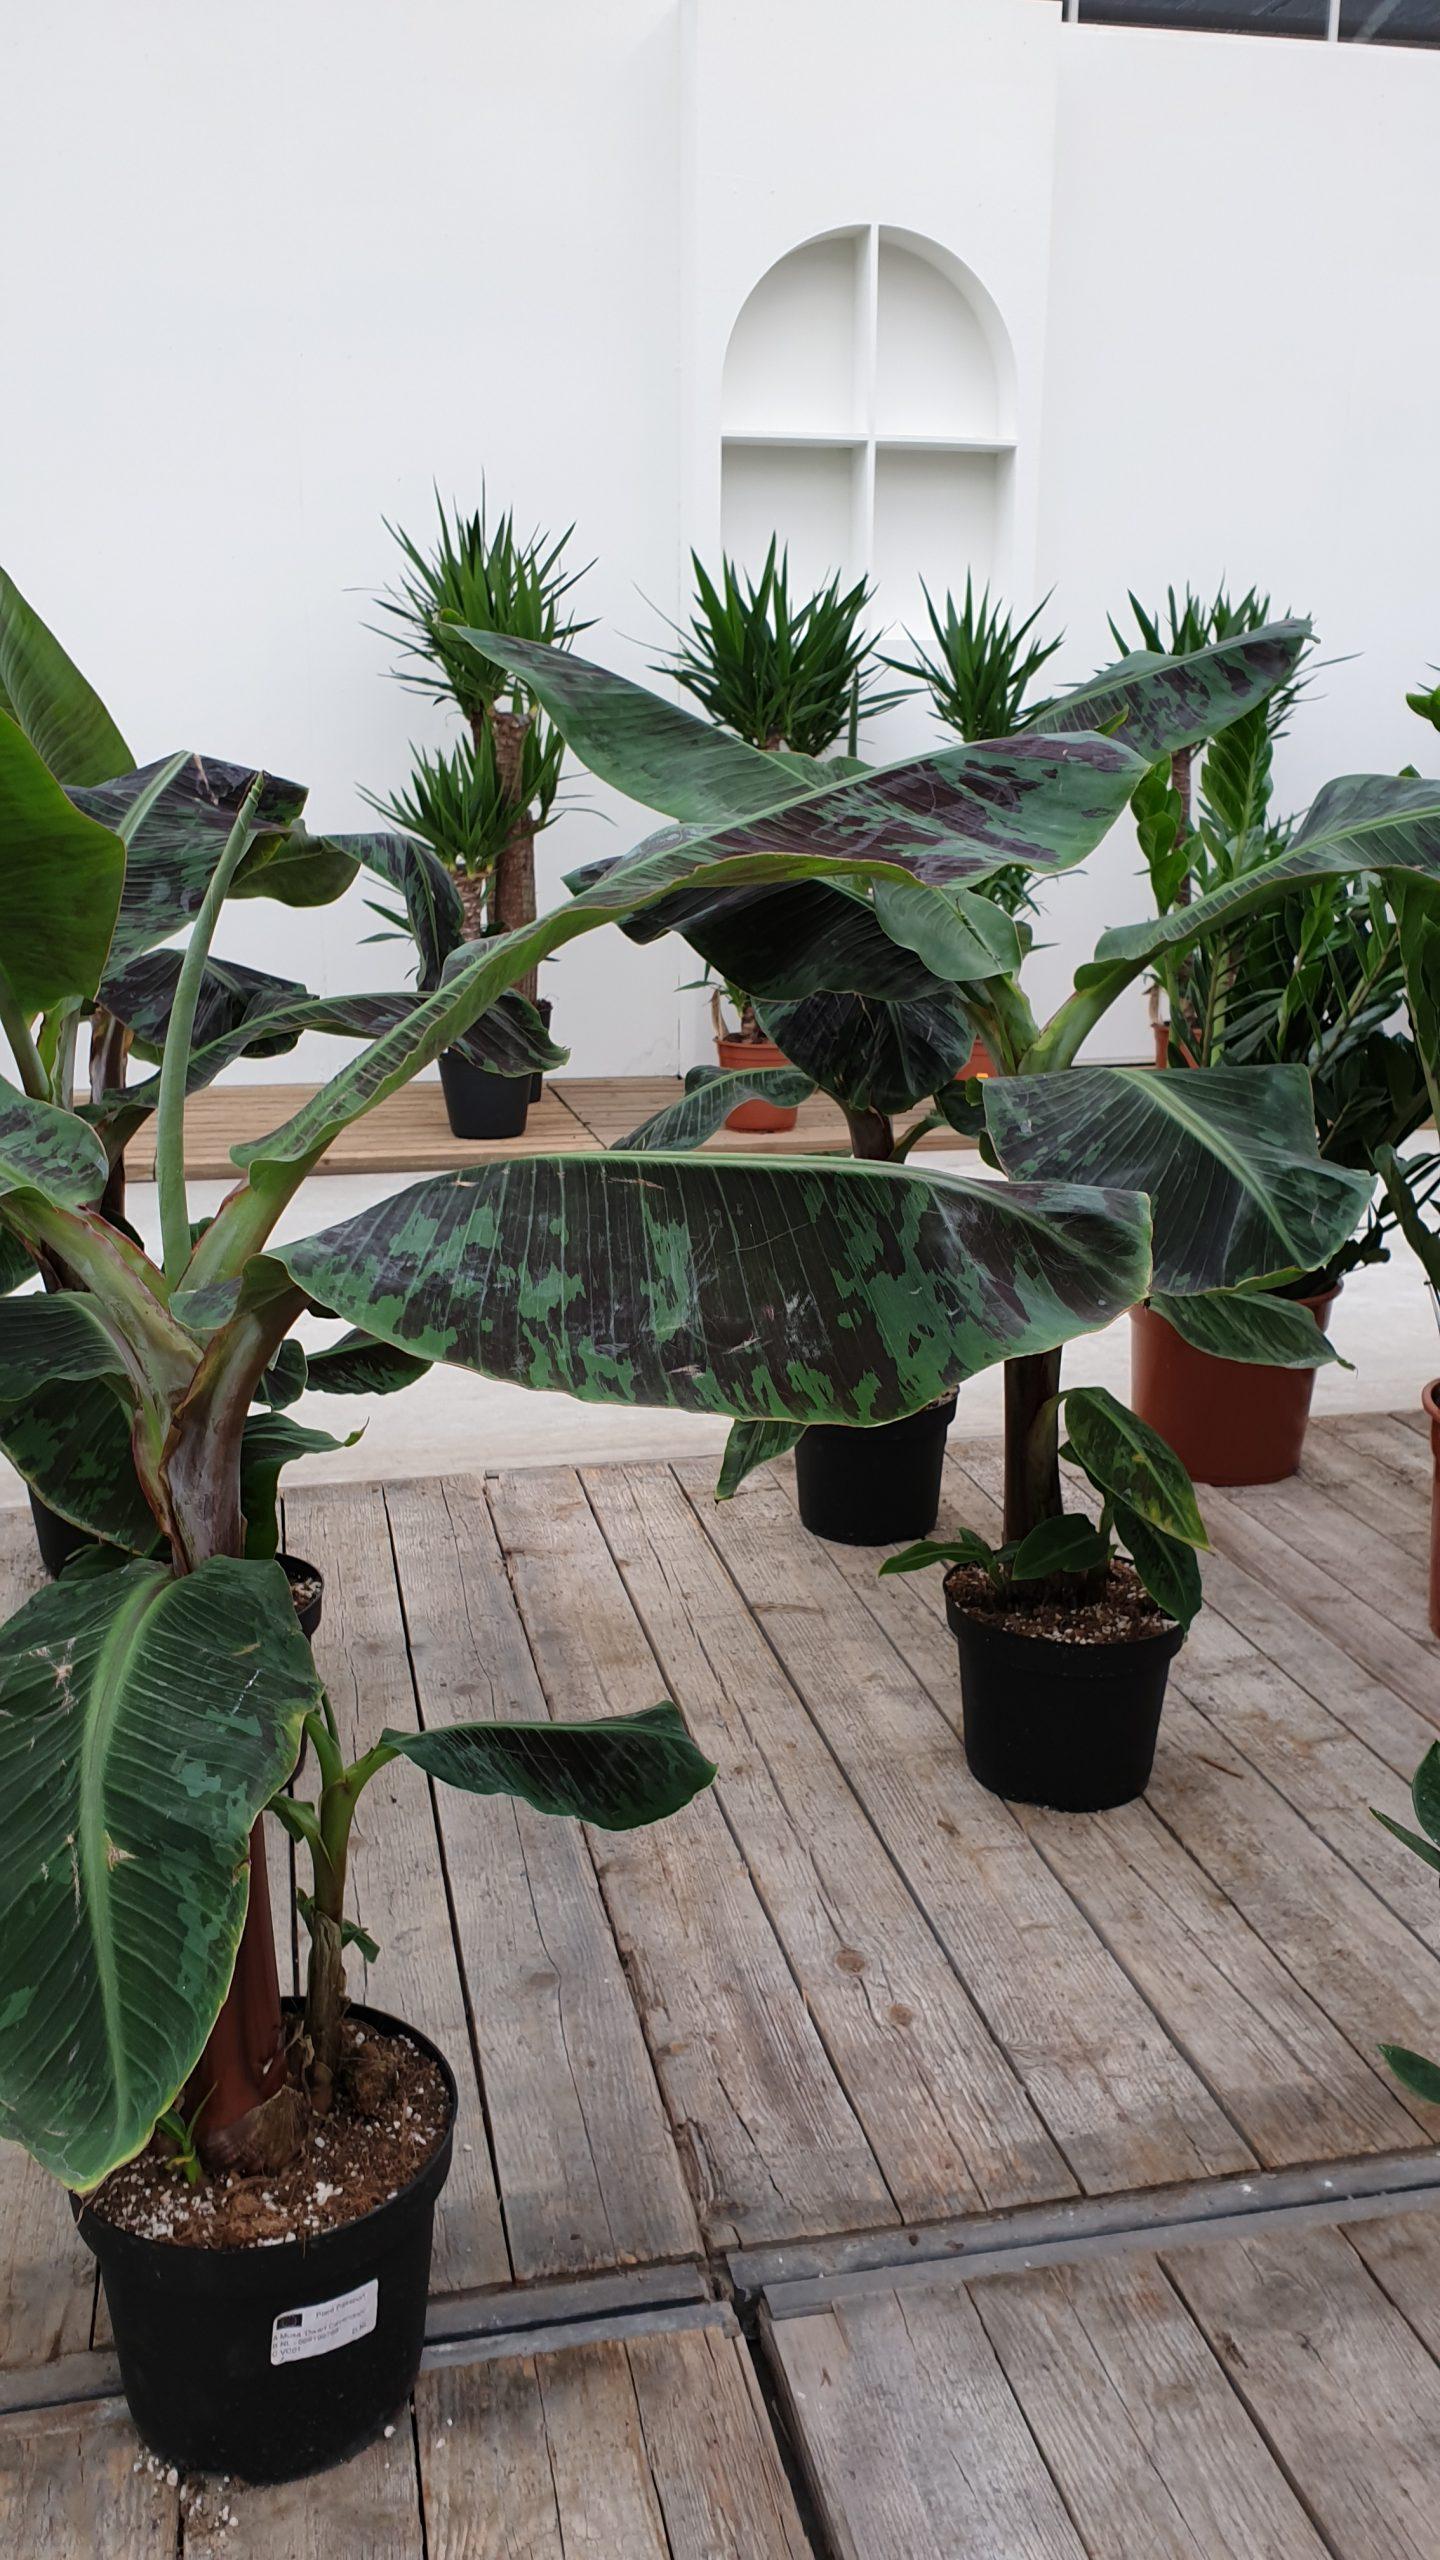 De bananenplant verzorgen